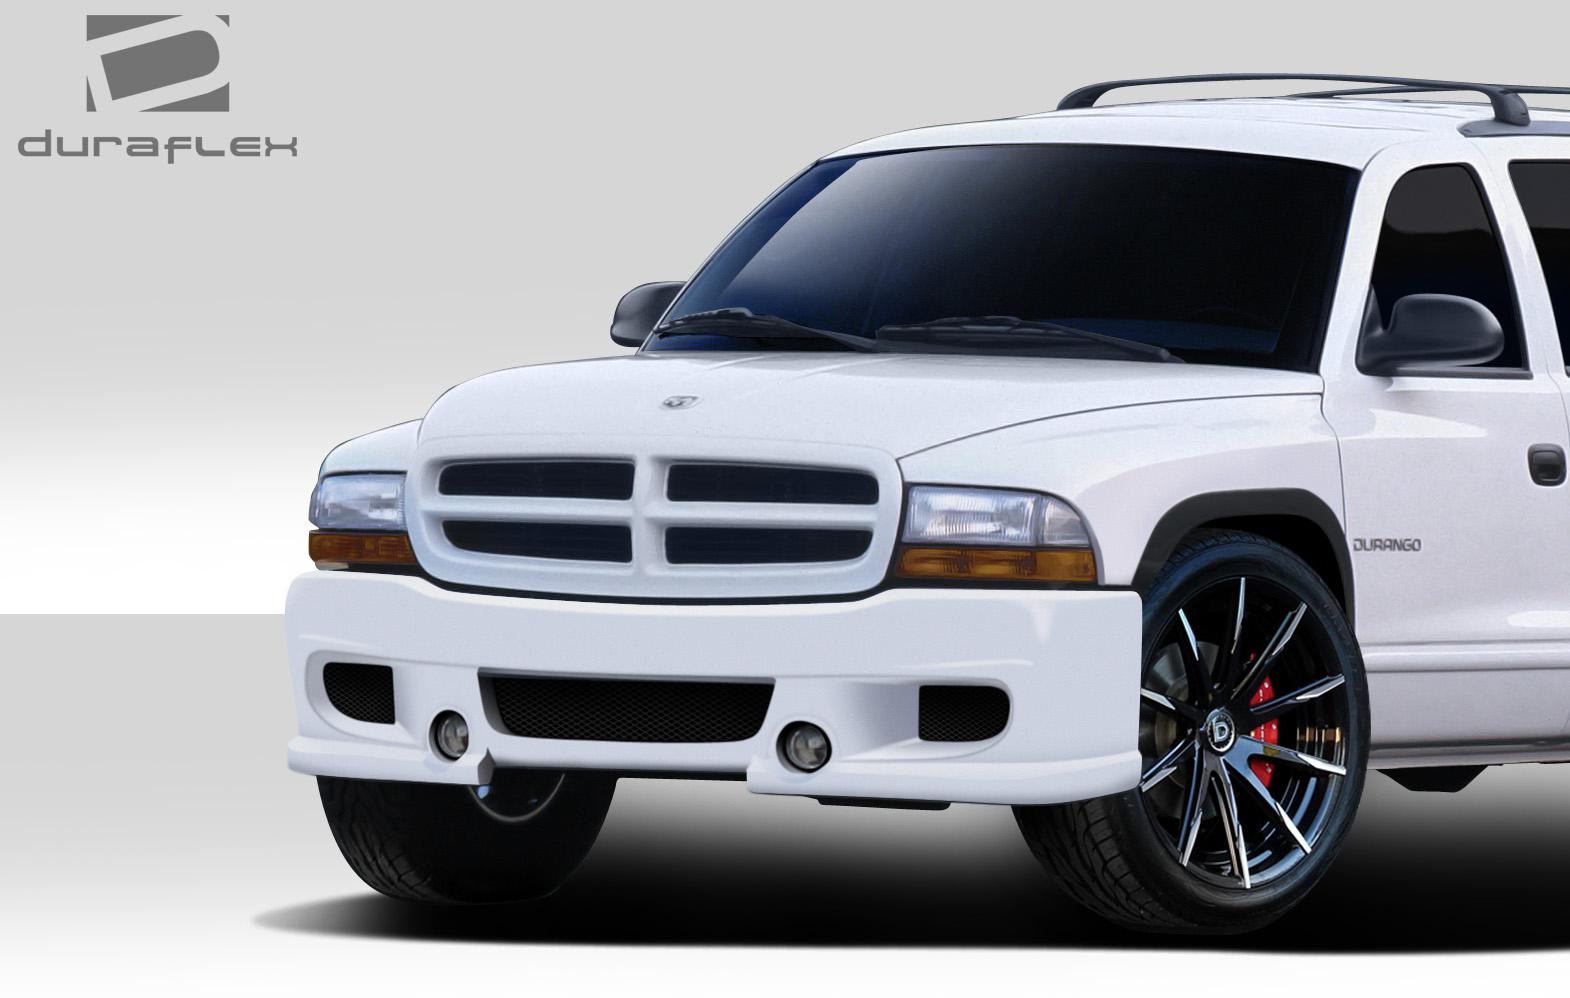 Duraflex Durango Bt 1 Front Bumper Cover 1 Piece For Dakota Dodge 98 03 Ed Ebay